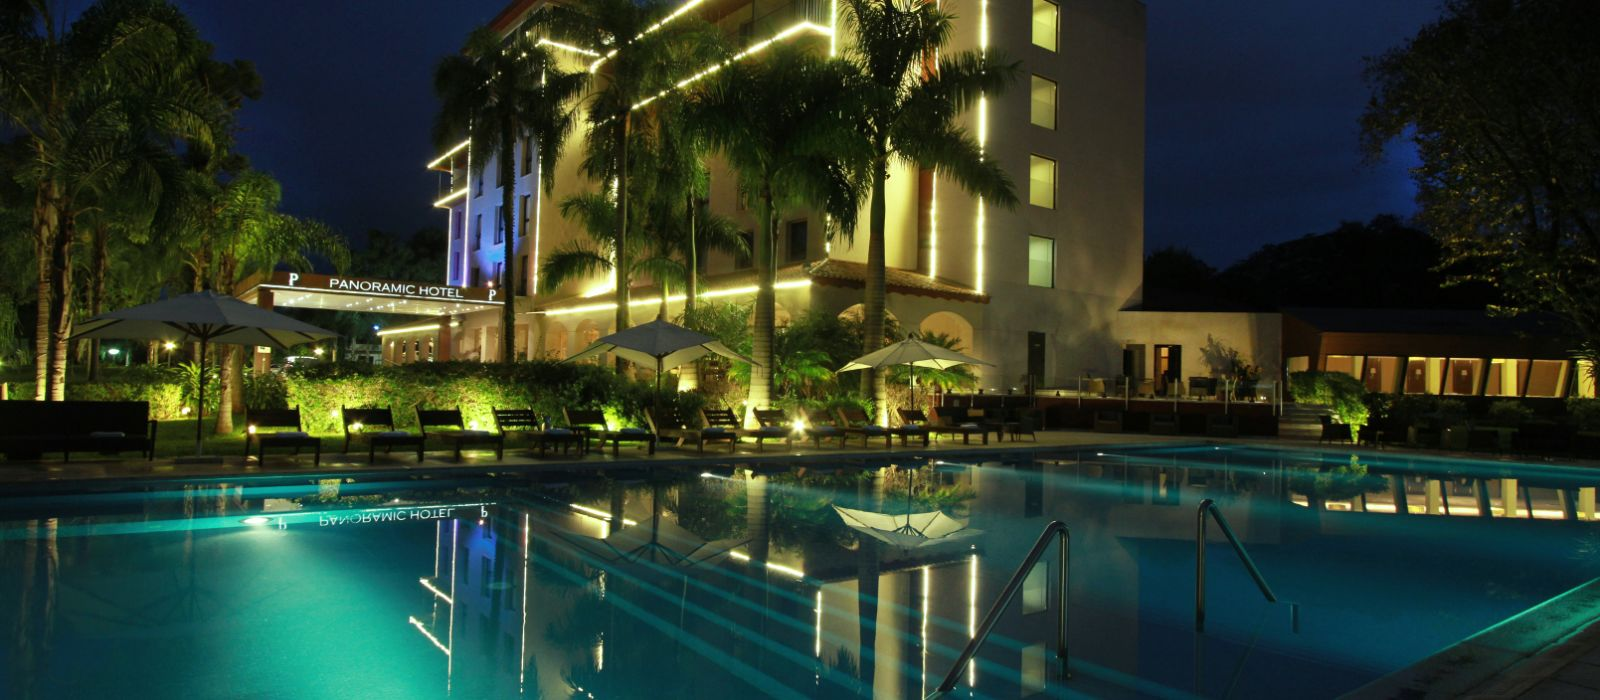 Hotel Panoramic Grand Argentinien